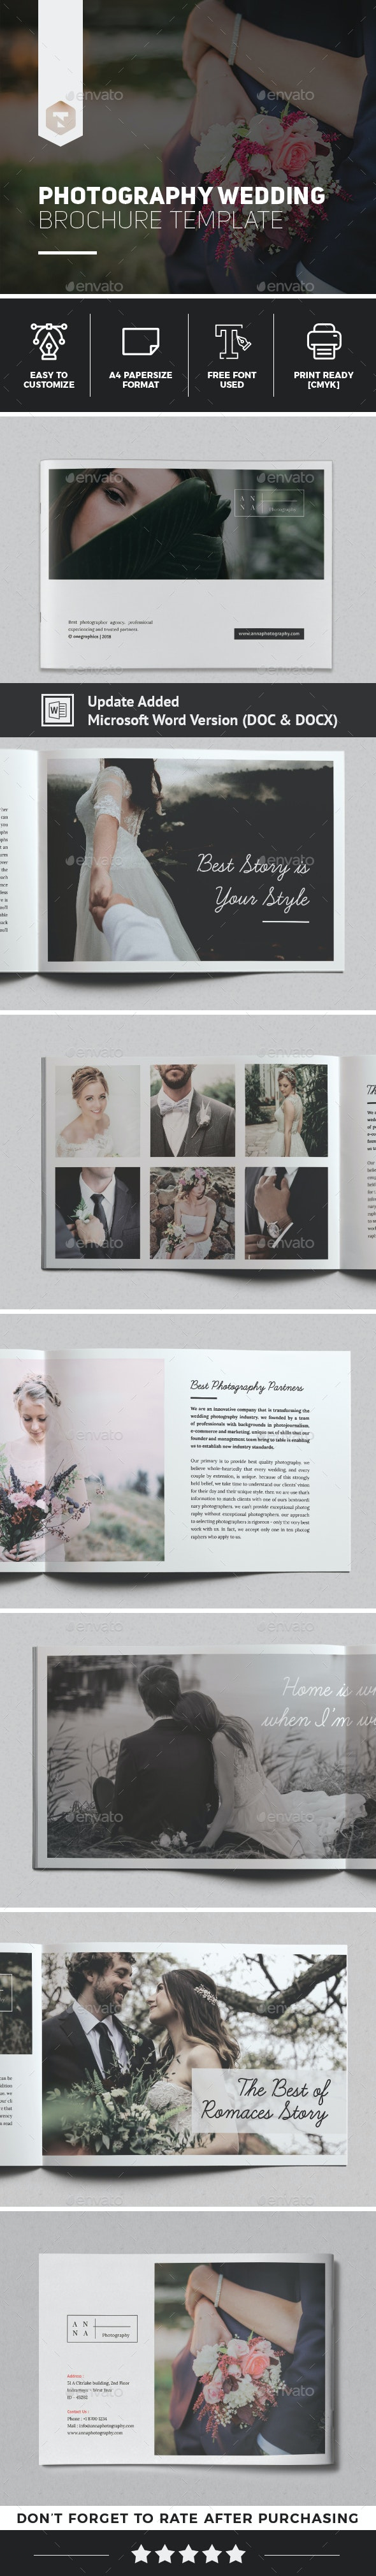 Anna Wedding Photography Brochure Template - Brochures Print Templates